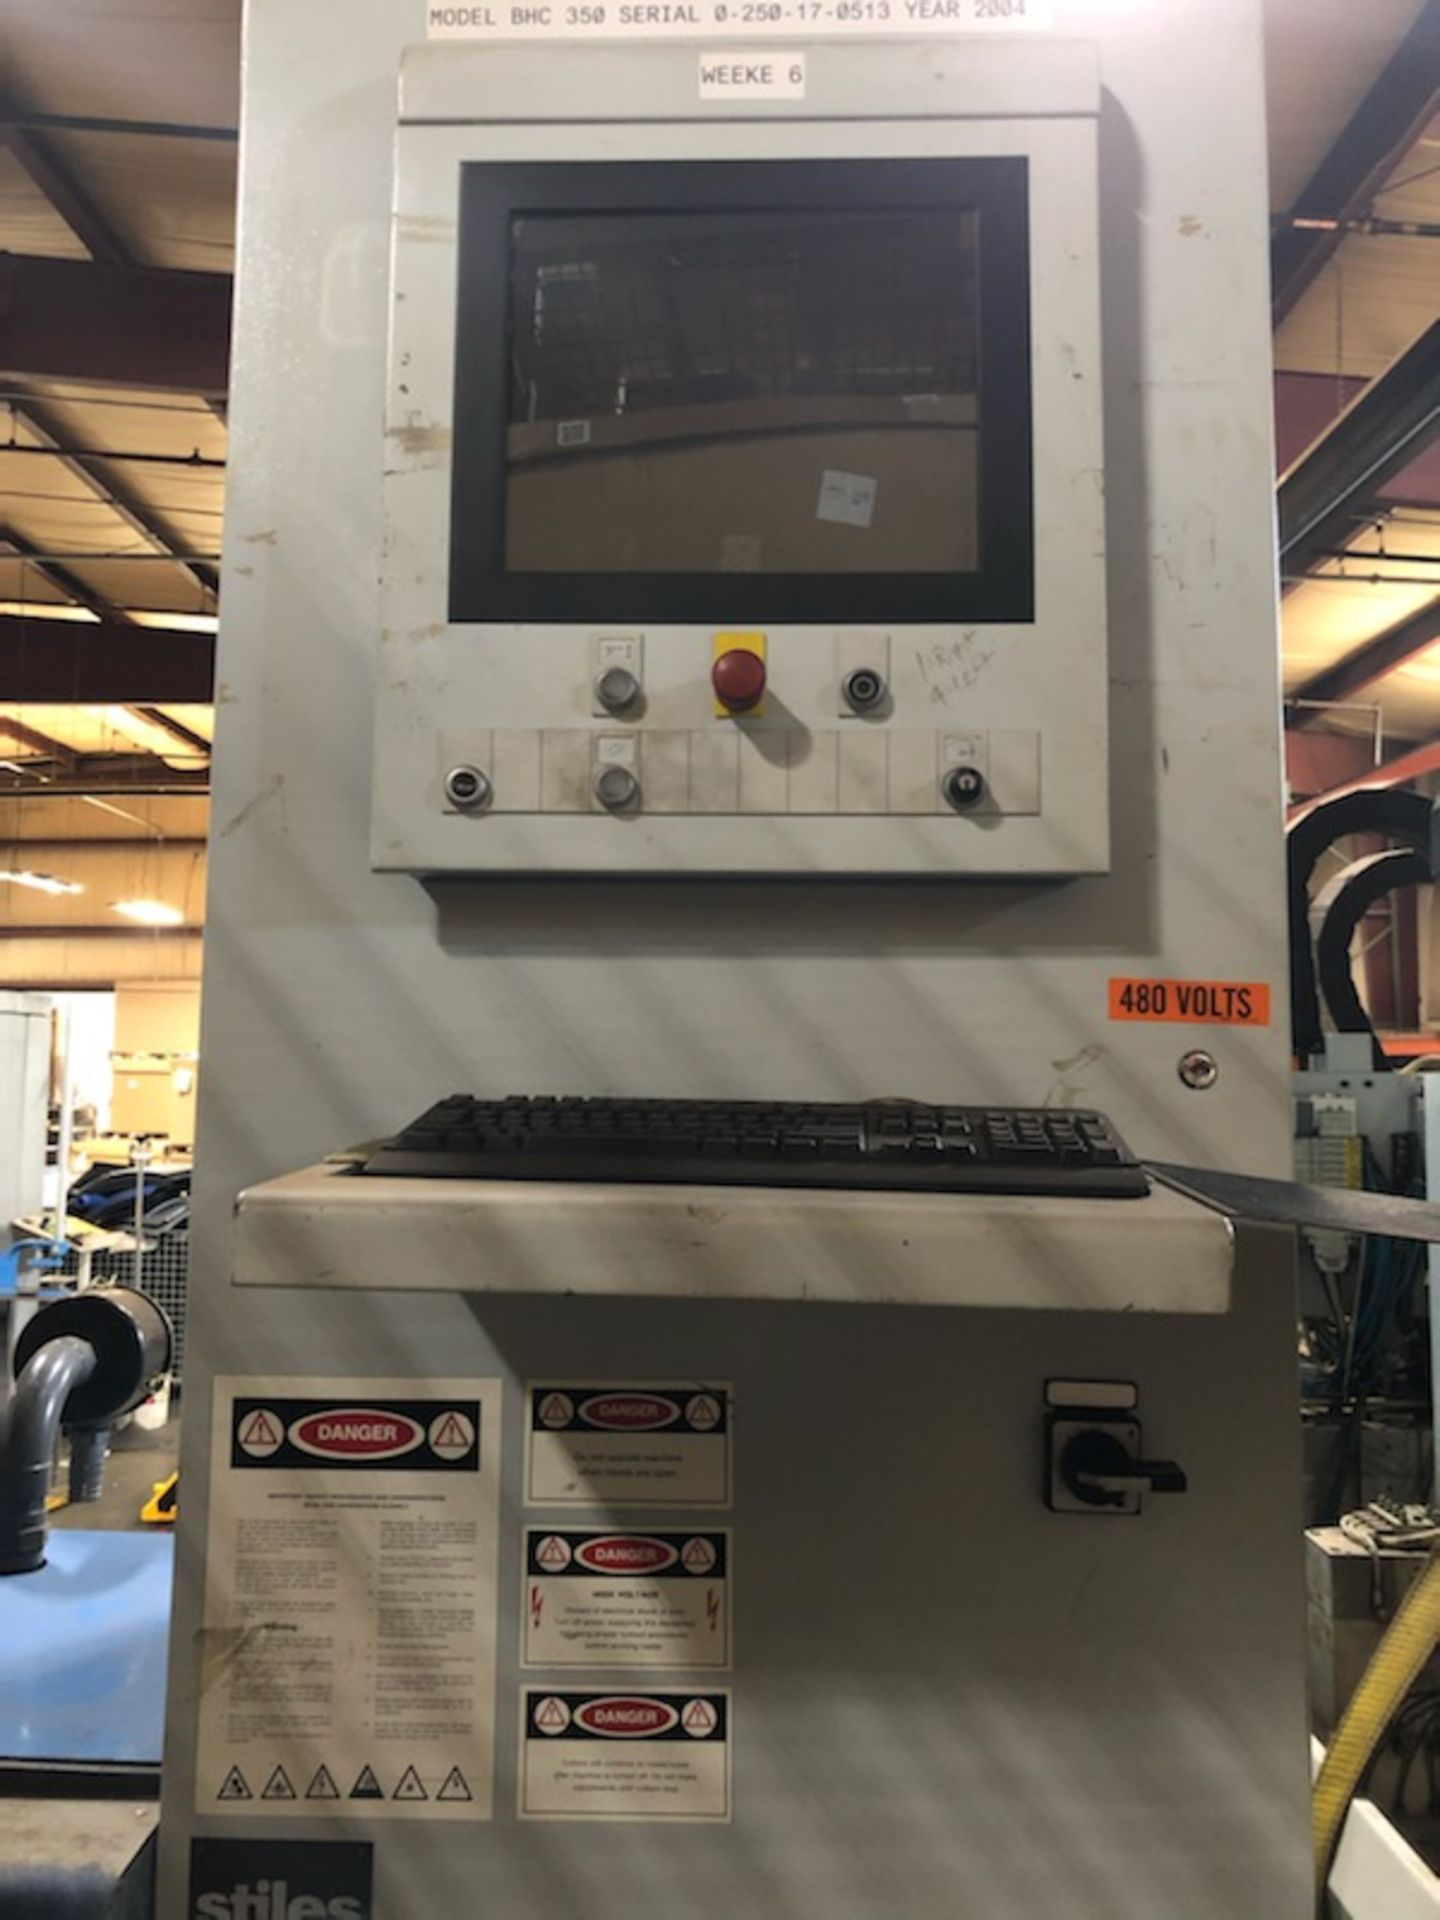 WEEKE BHC-350 Wood CNC MACHINING CENTER - Image 3 of 11